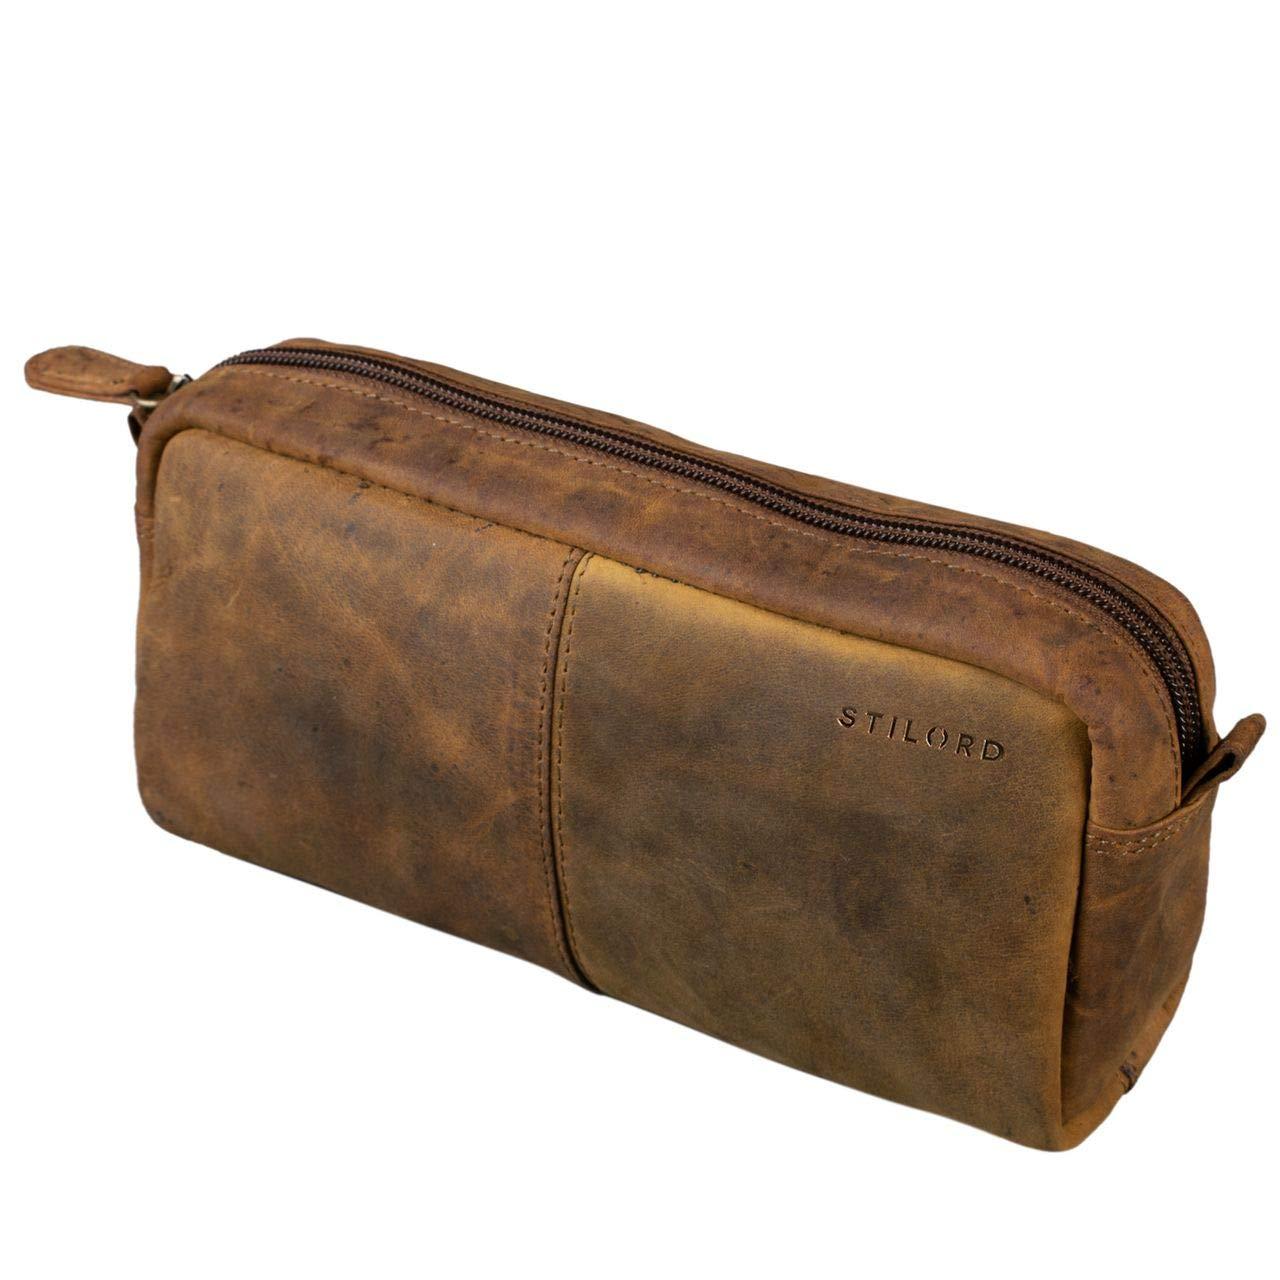 STILORD 'Spencer' Estuche para Lápices Cuero Vintage Bolsa Portatodo para Maquillaje Cartuchera de Genuino Piel, Color:Calais – marrón